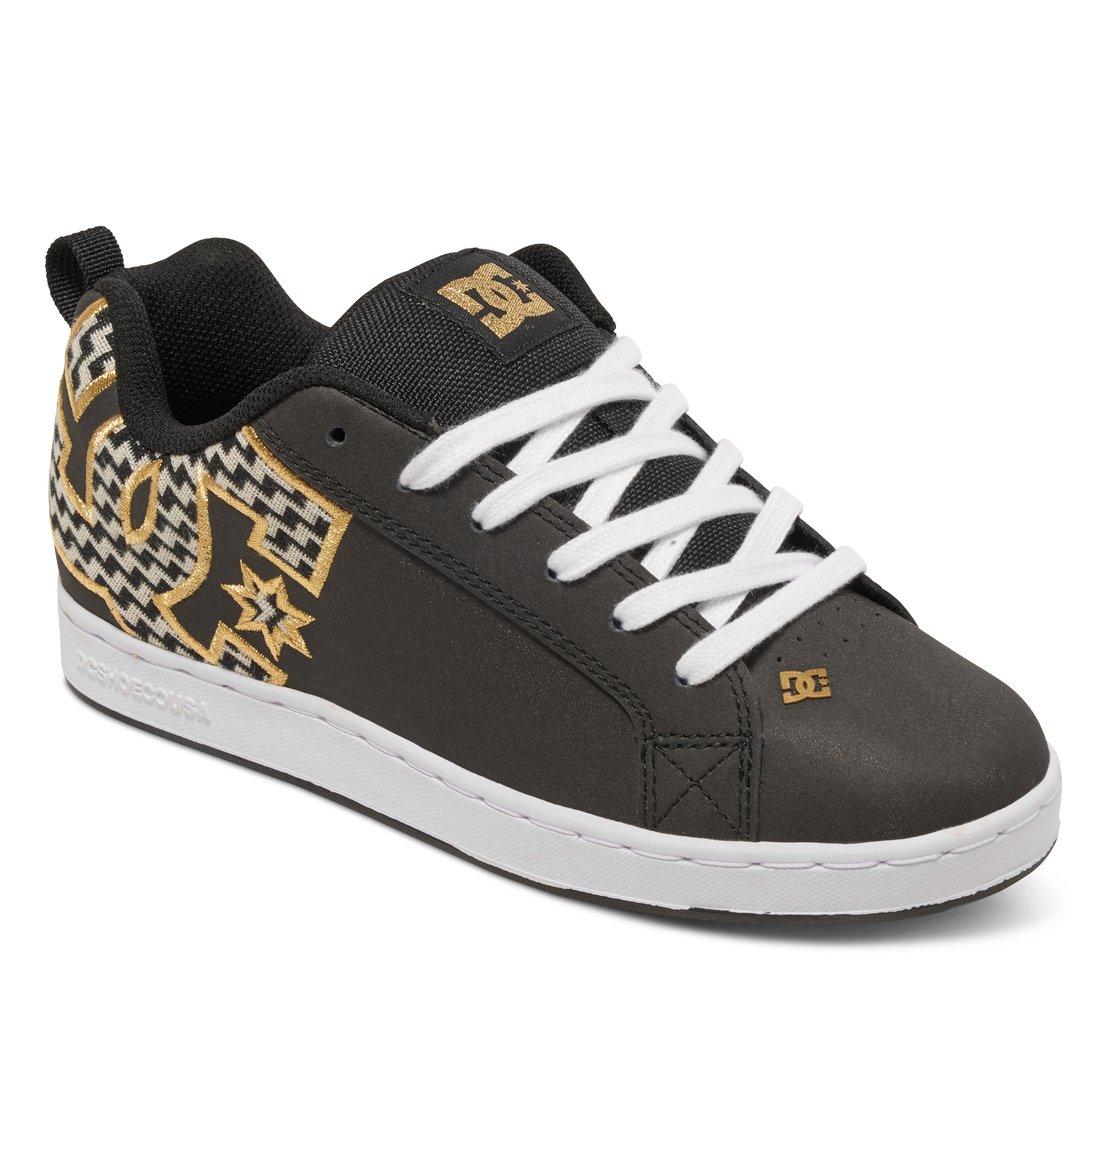 Dc Womens Graffik Shoes